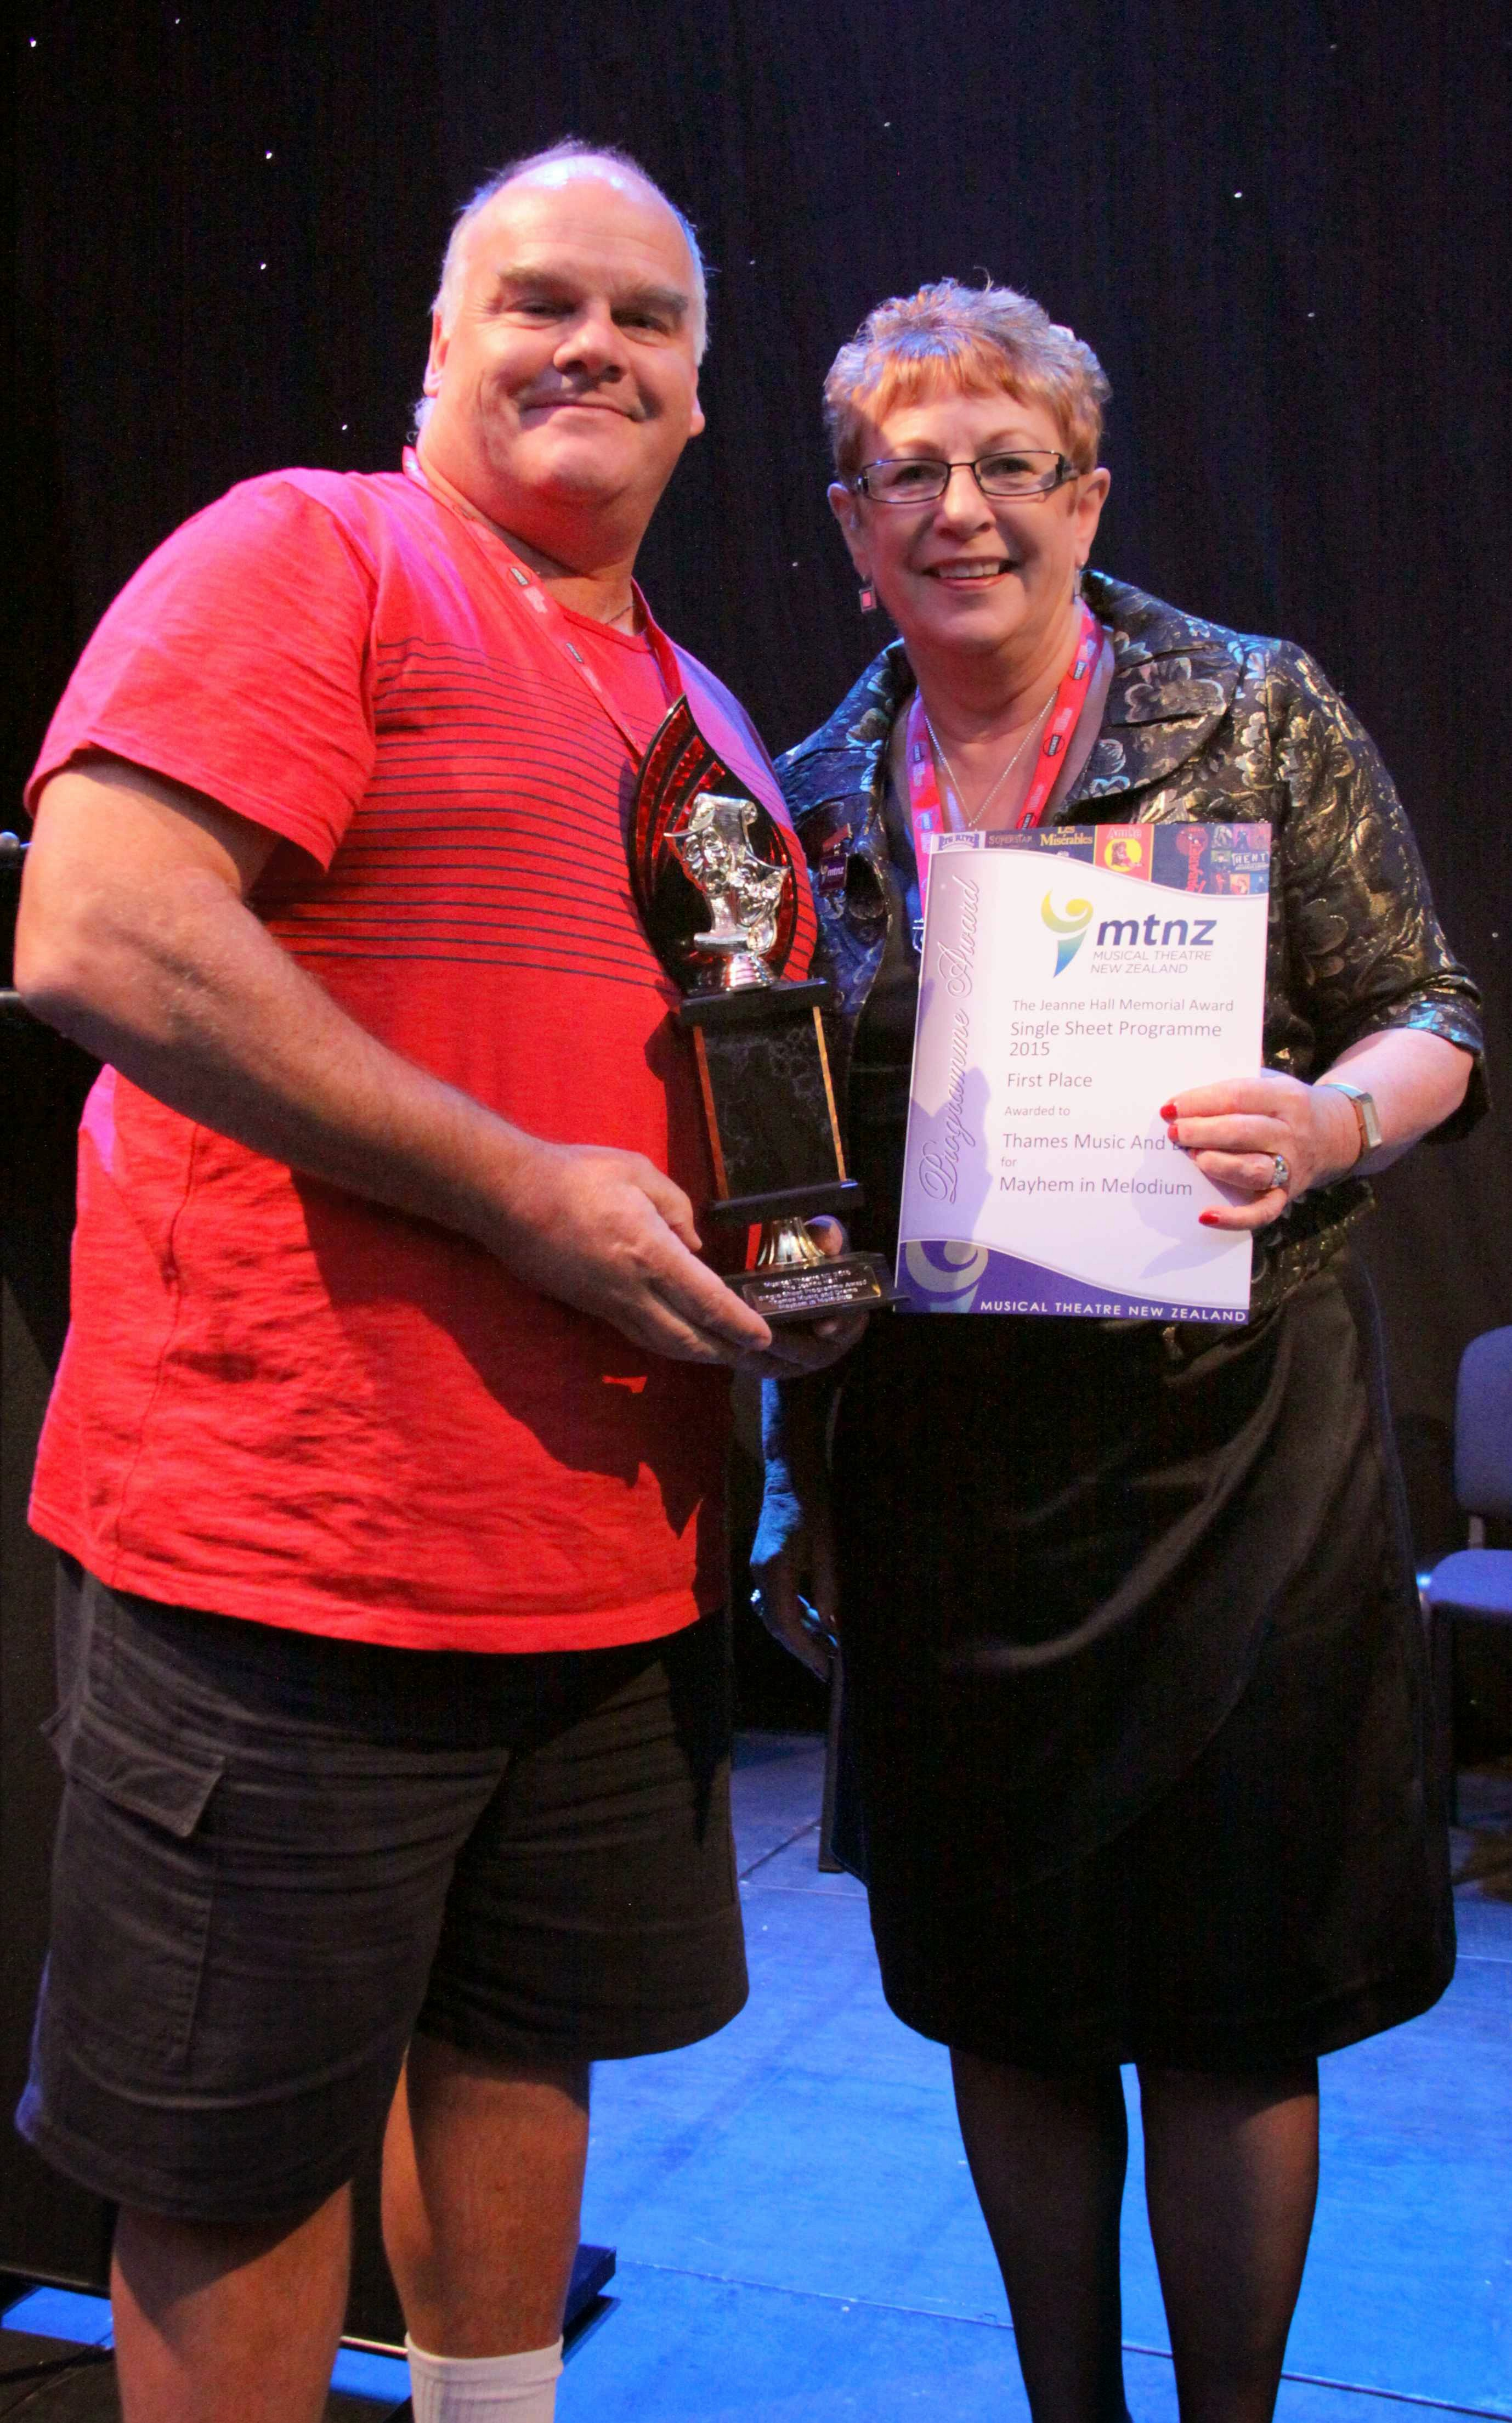 Best Programme award